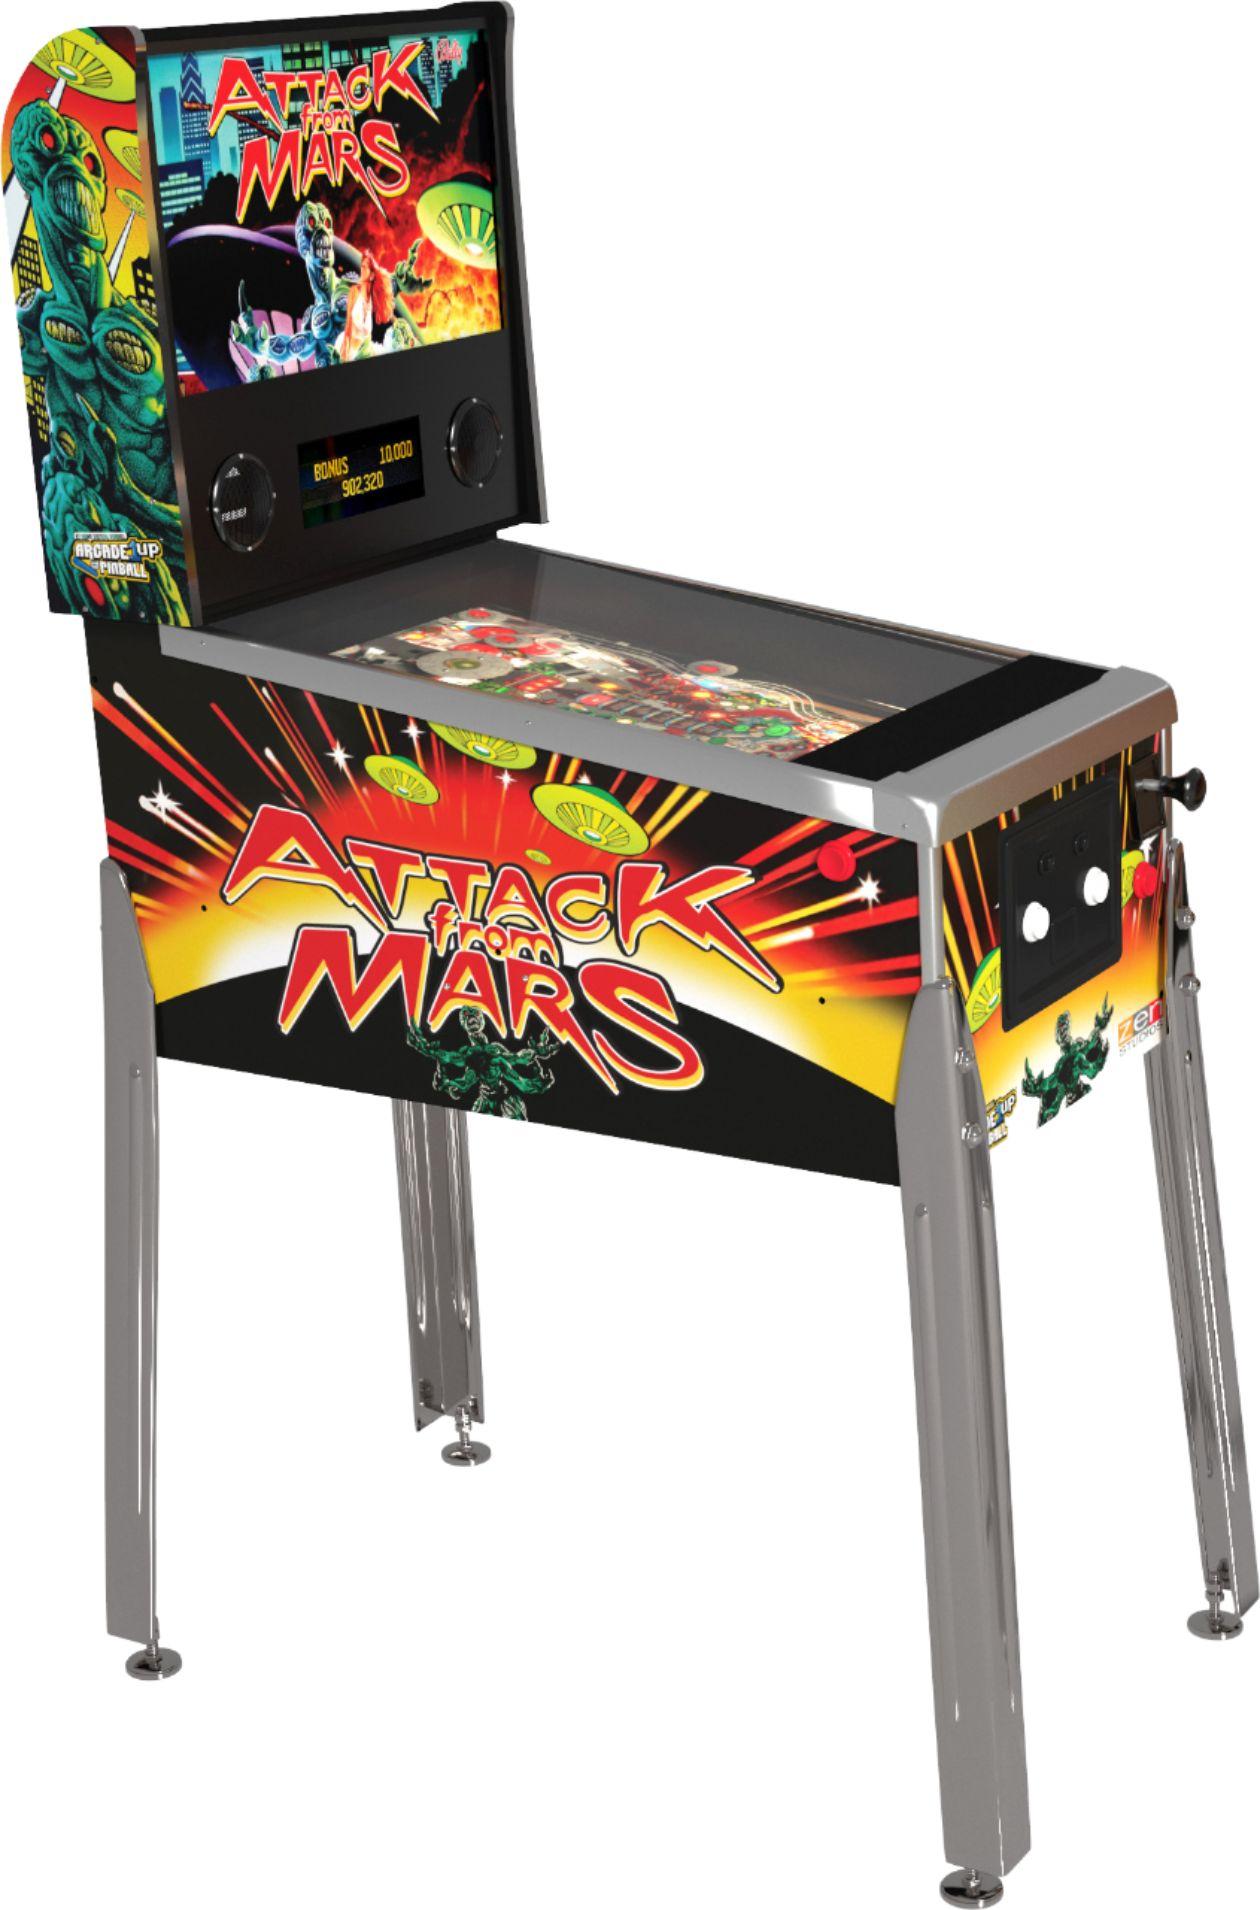 Arcade1Up Williams Bally Attack From Mars Pinball Digital - Best Buy $599